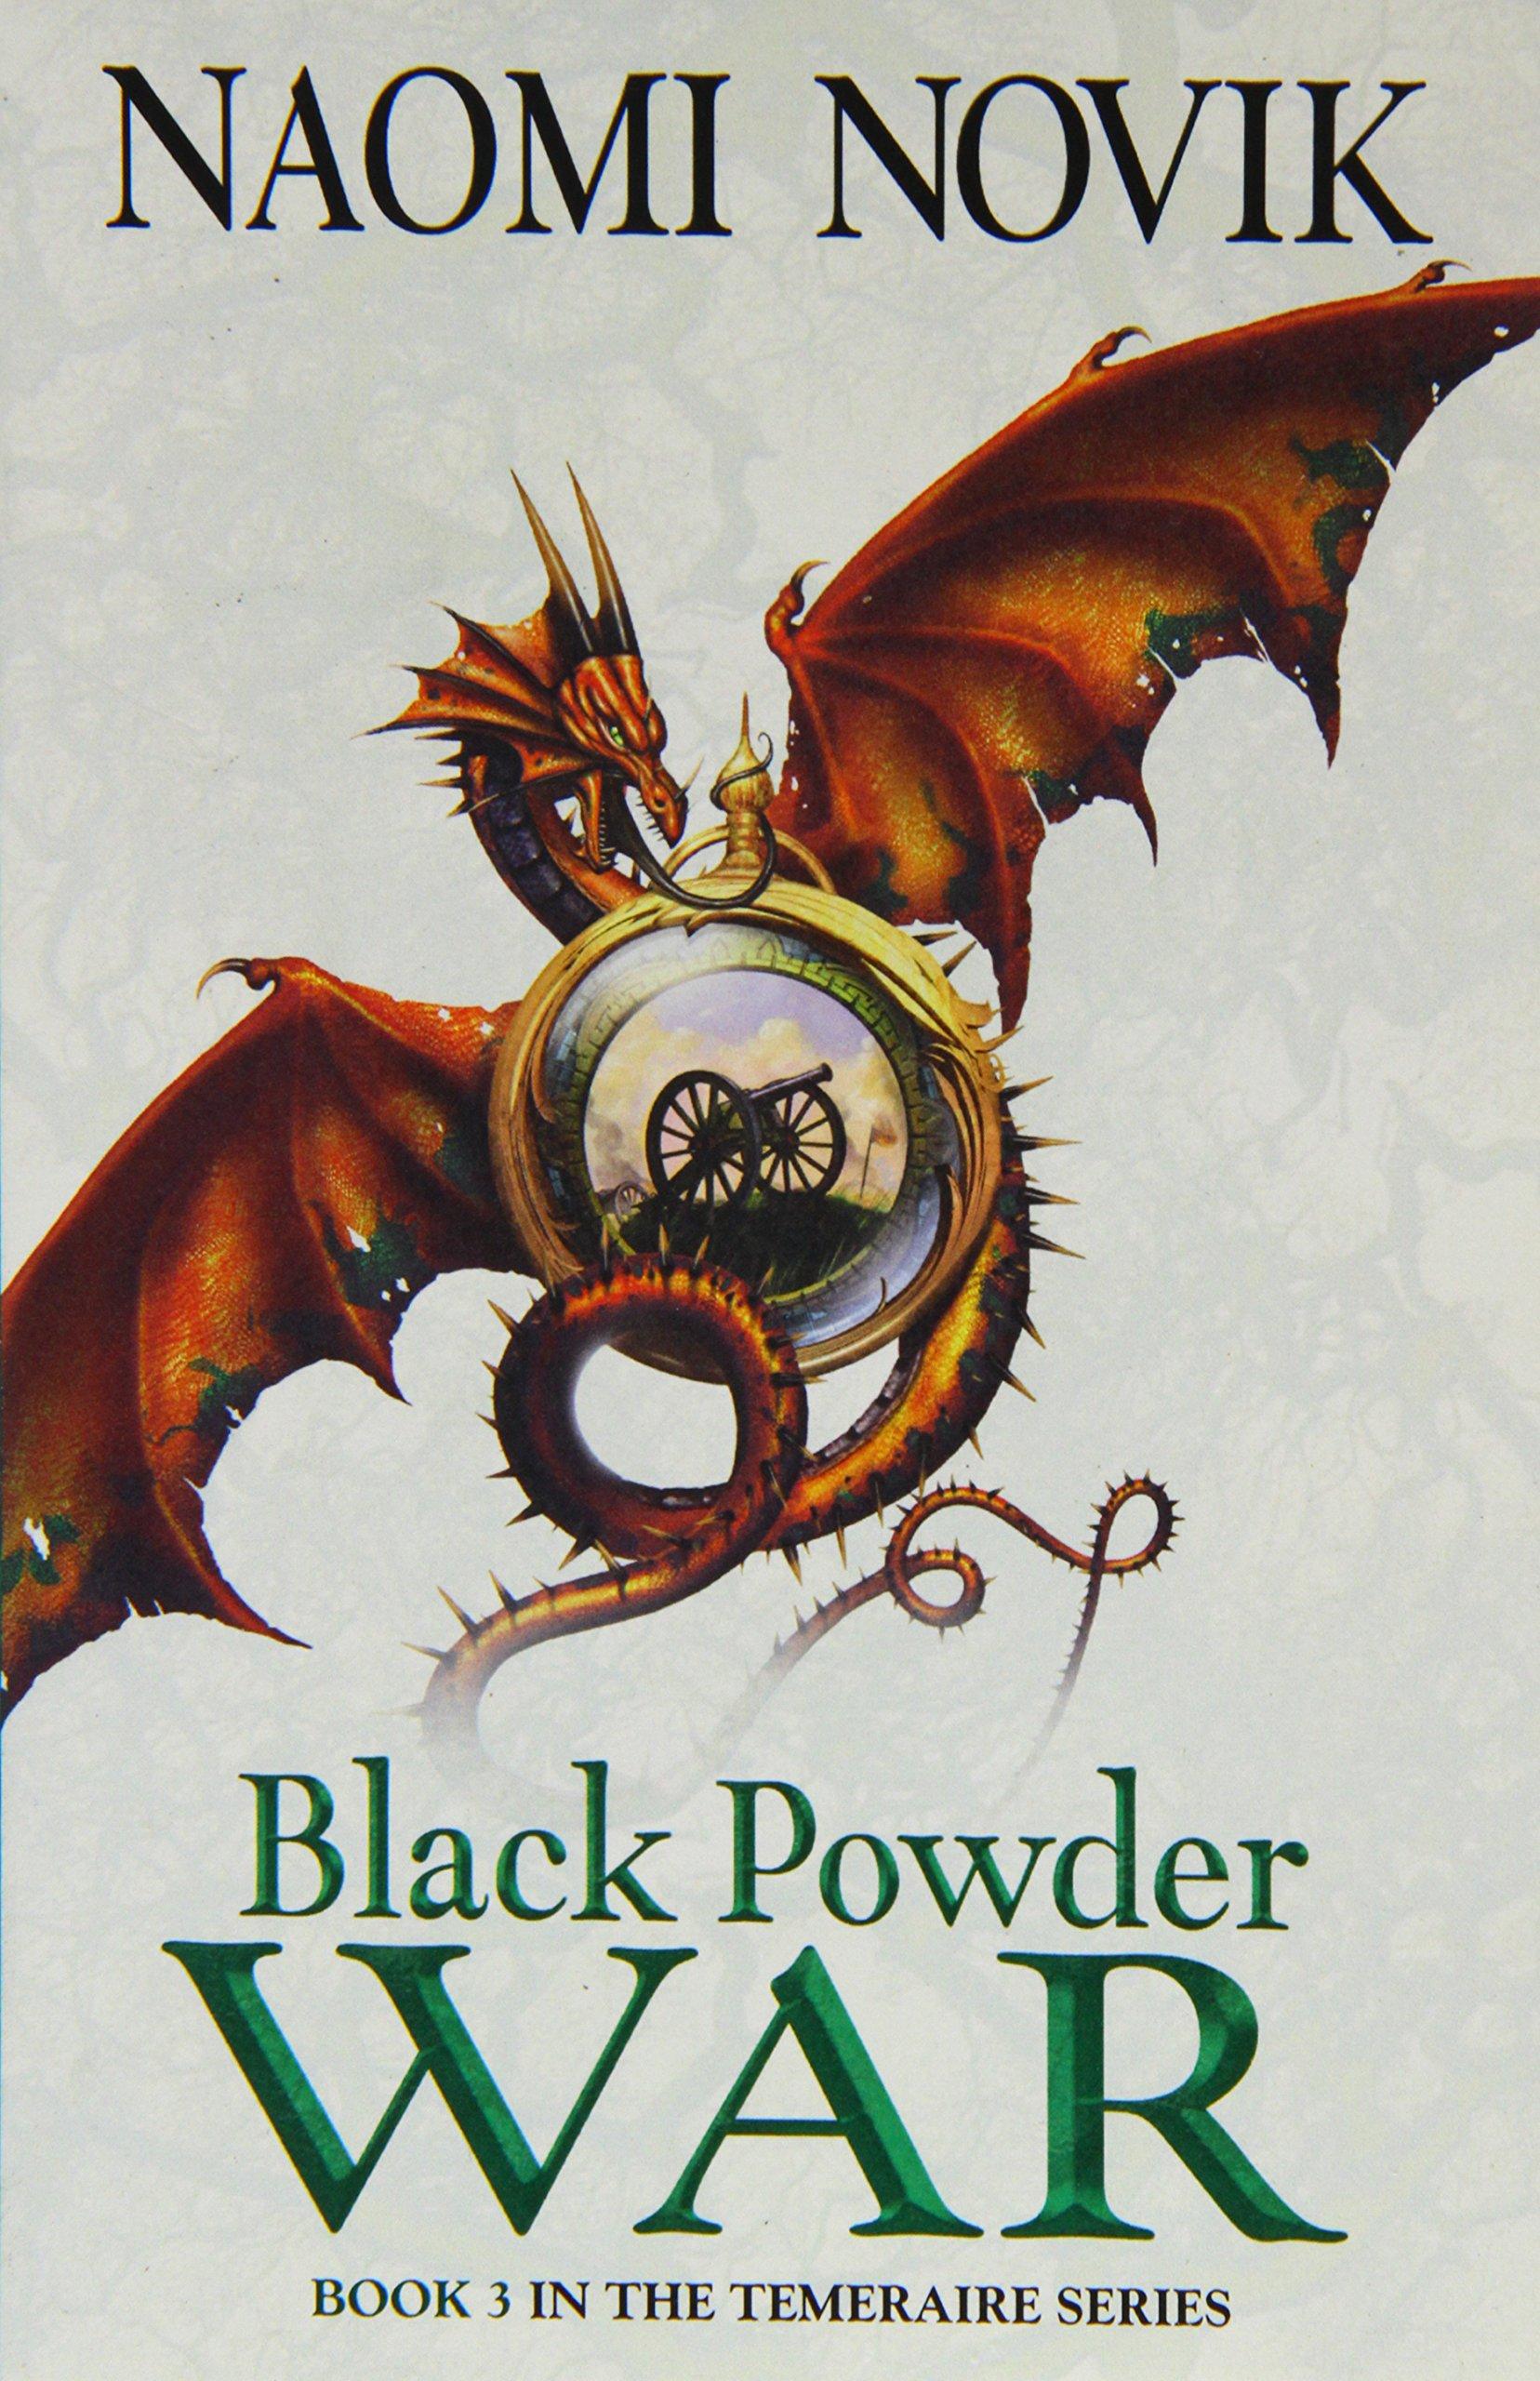 Black Powder War (the Temeraire Series, Book 3): Amazon: Naomi Novik:  9780007219179: Books